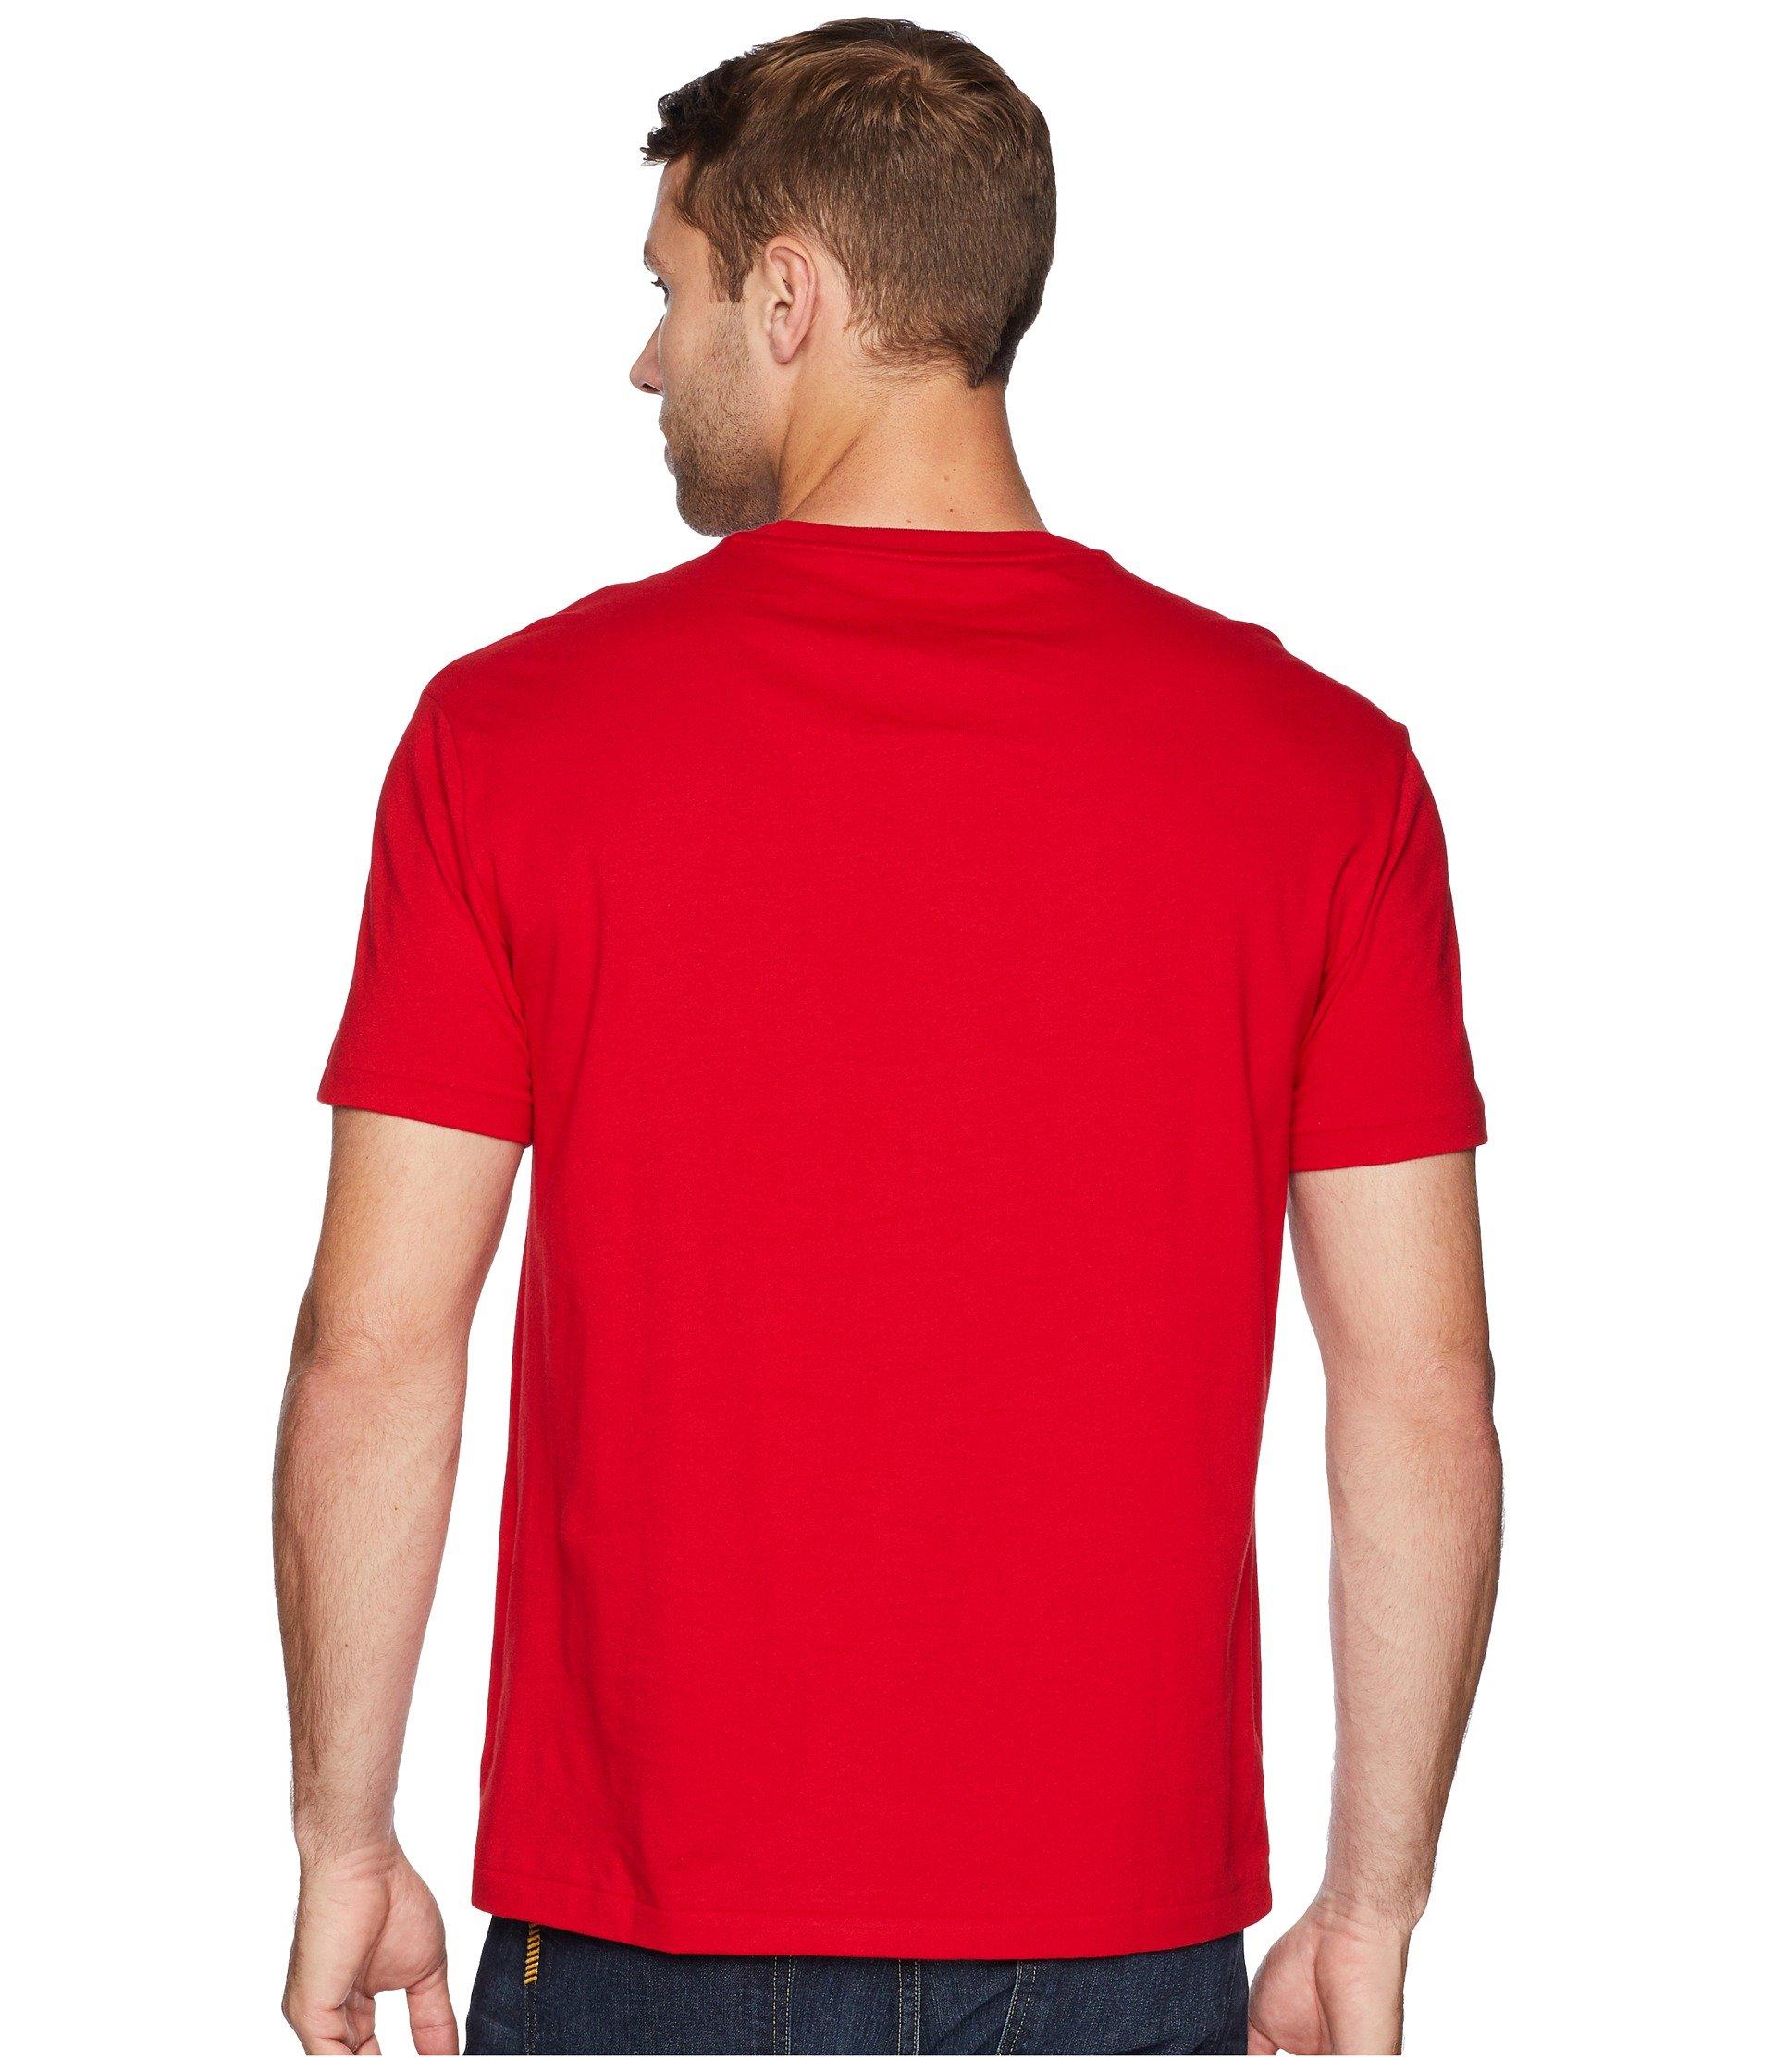 Fit Ralph Classic Lauren Red Crew Polo Rl2000 T shirt Neck pqFtnBBxR